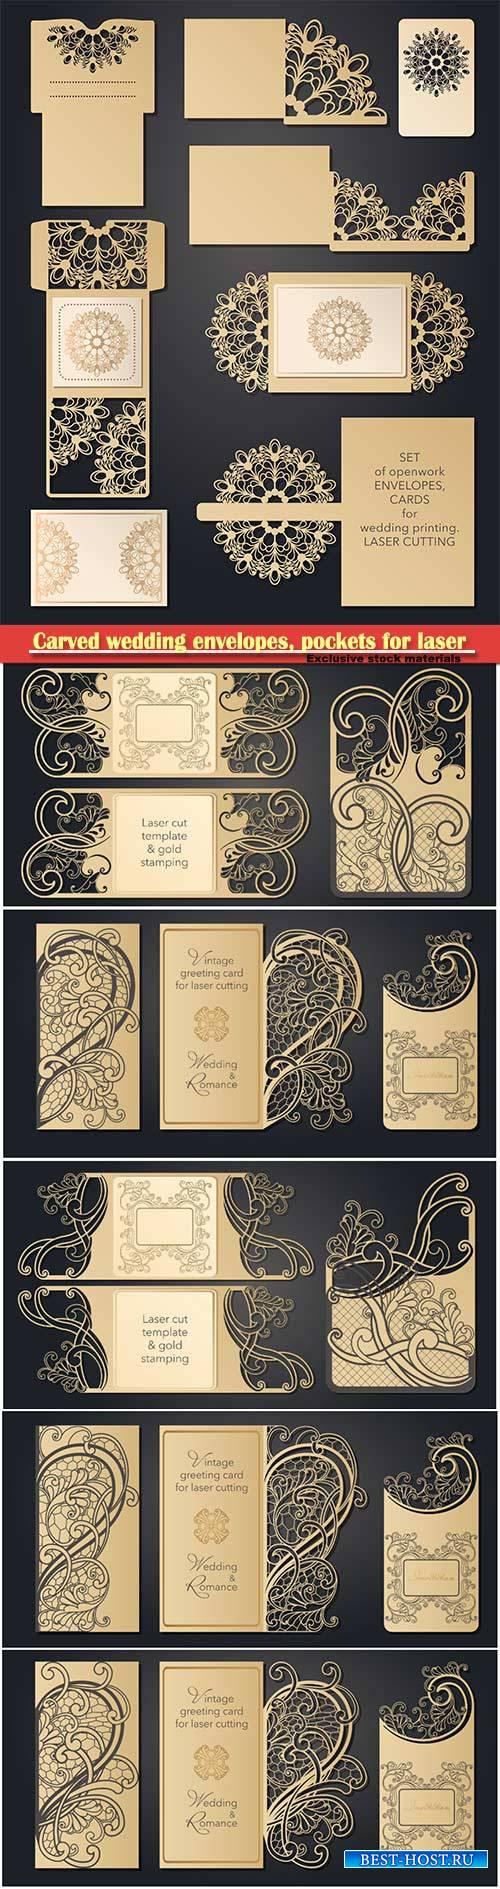 Carved wedding envelopes, pockets for laser cutting, invitations, wedding c ...